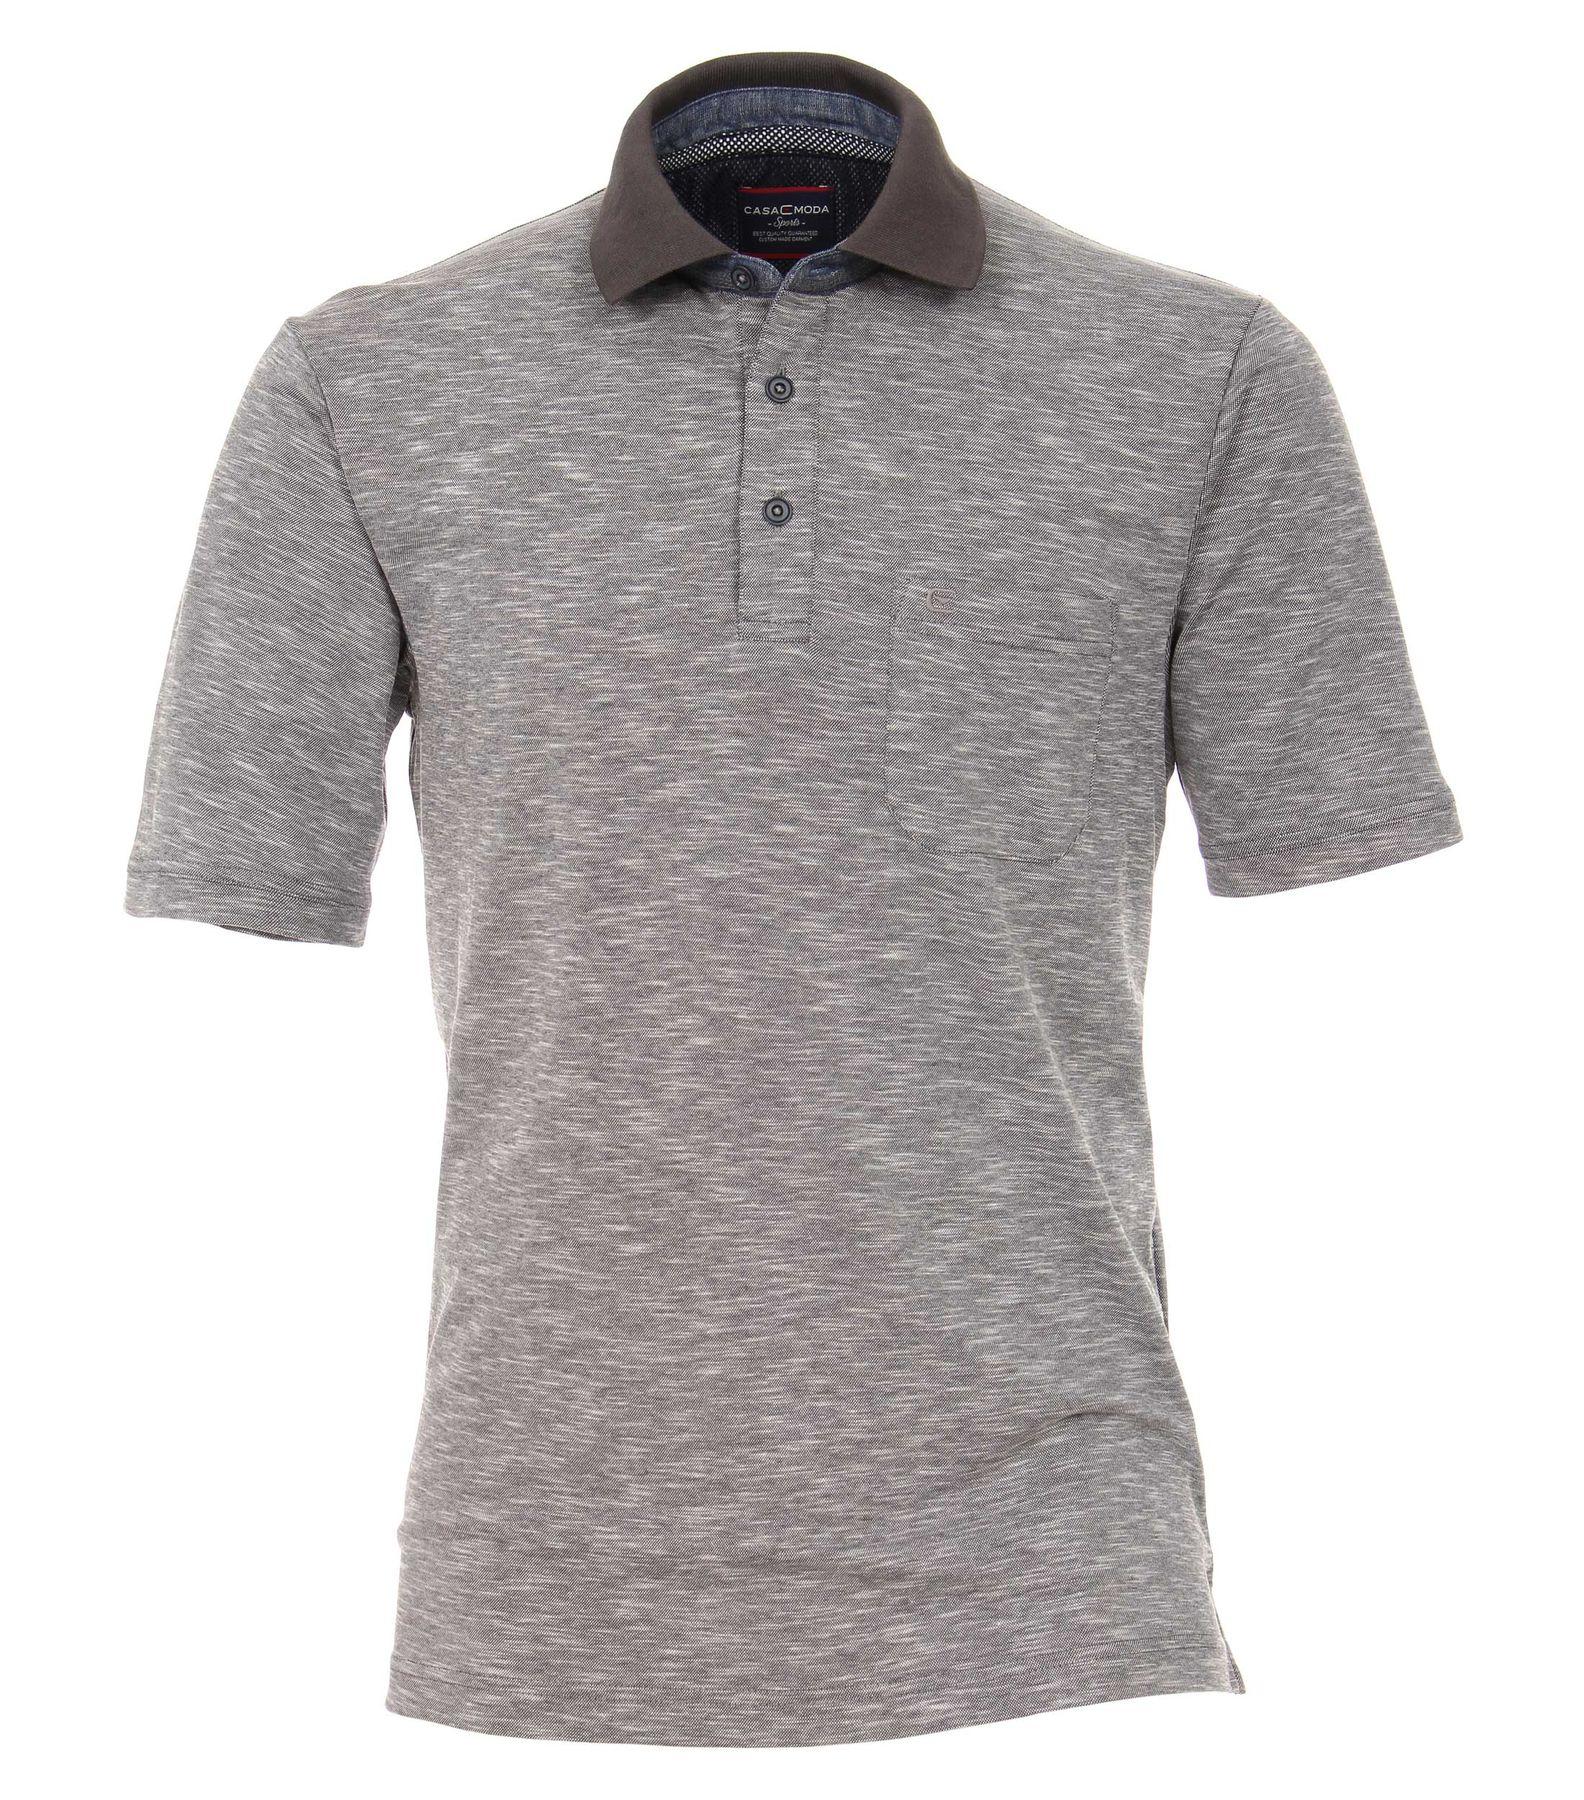 Casa Moda - Herren Polo Shirt 1/2 Arm in verschiedenen Farben (982894100) – Bild 8